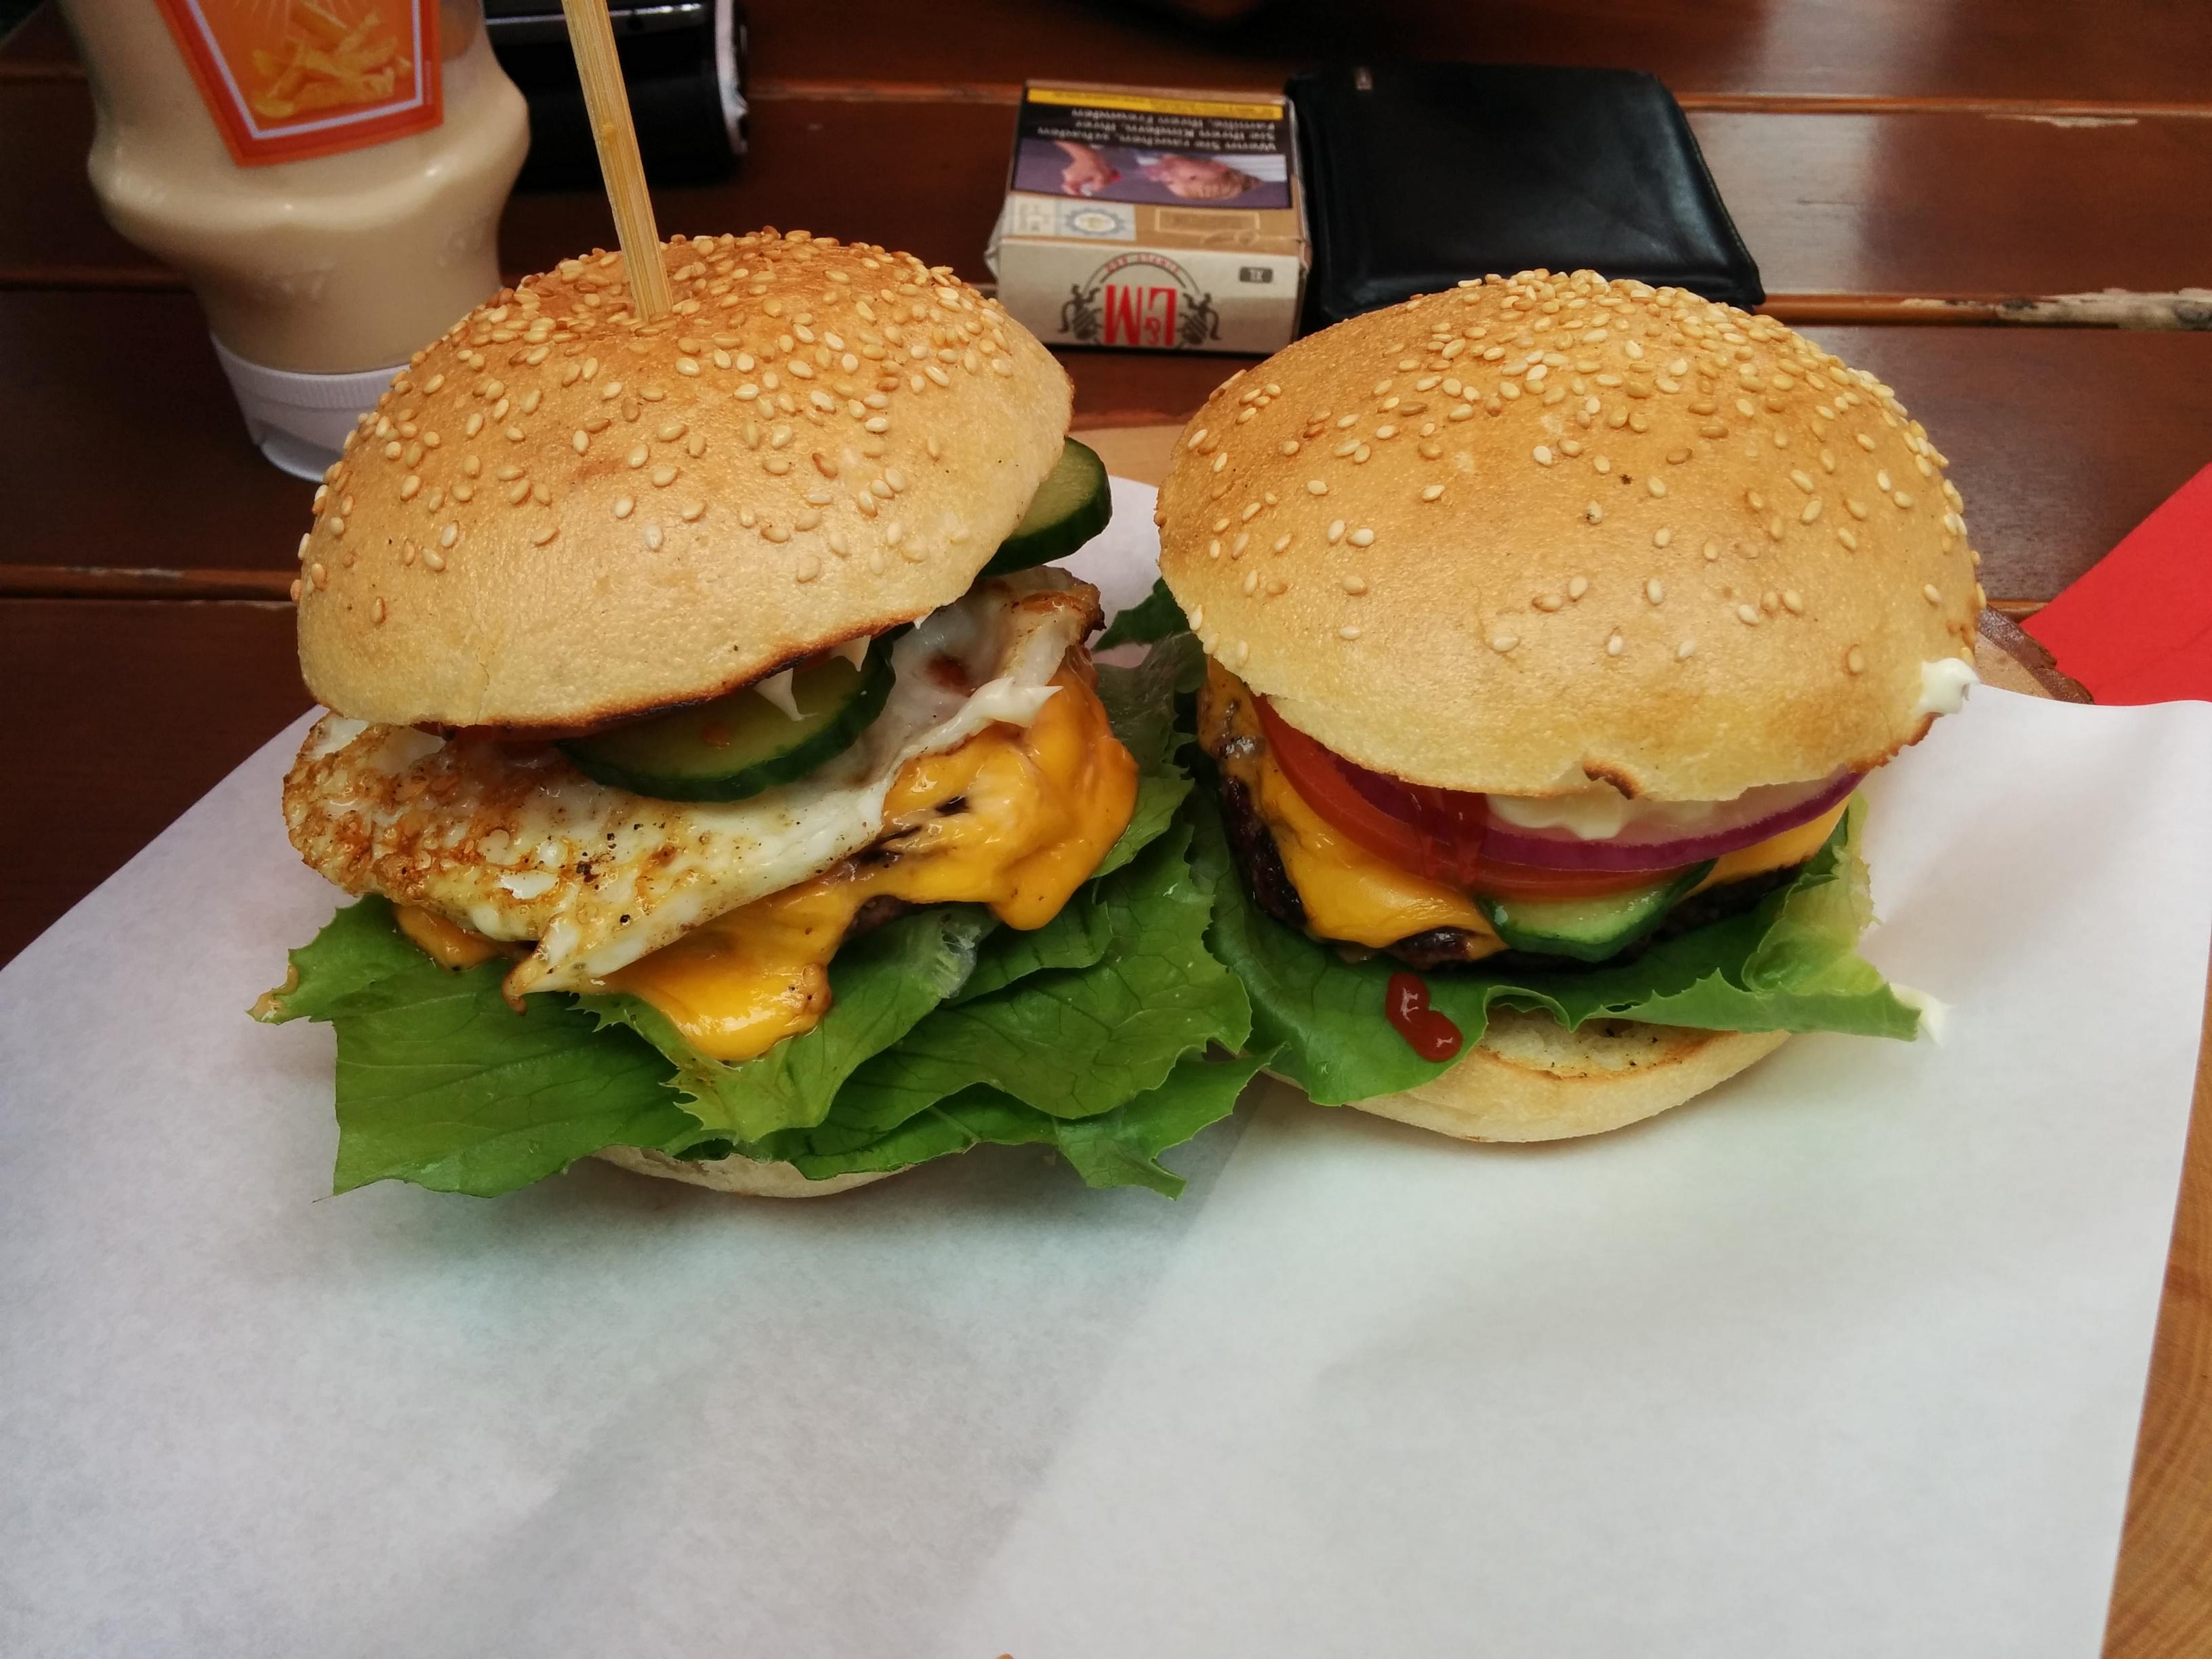 http://foodloader.net/nico_2017-07-11_cheeseburger-und-cheggburger.jpg